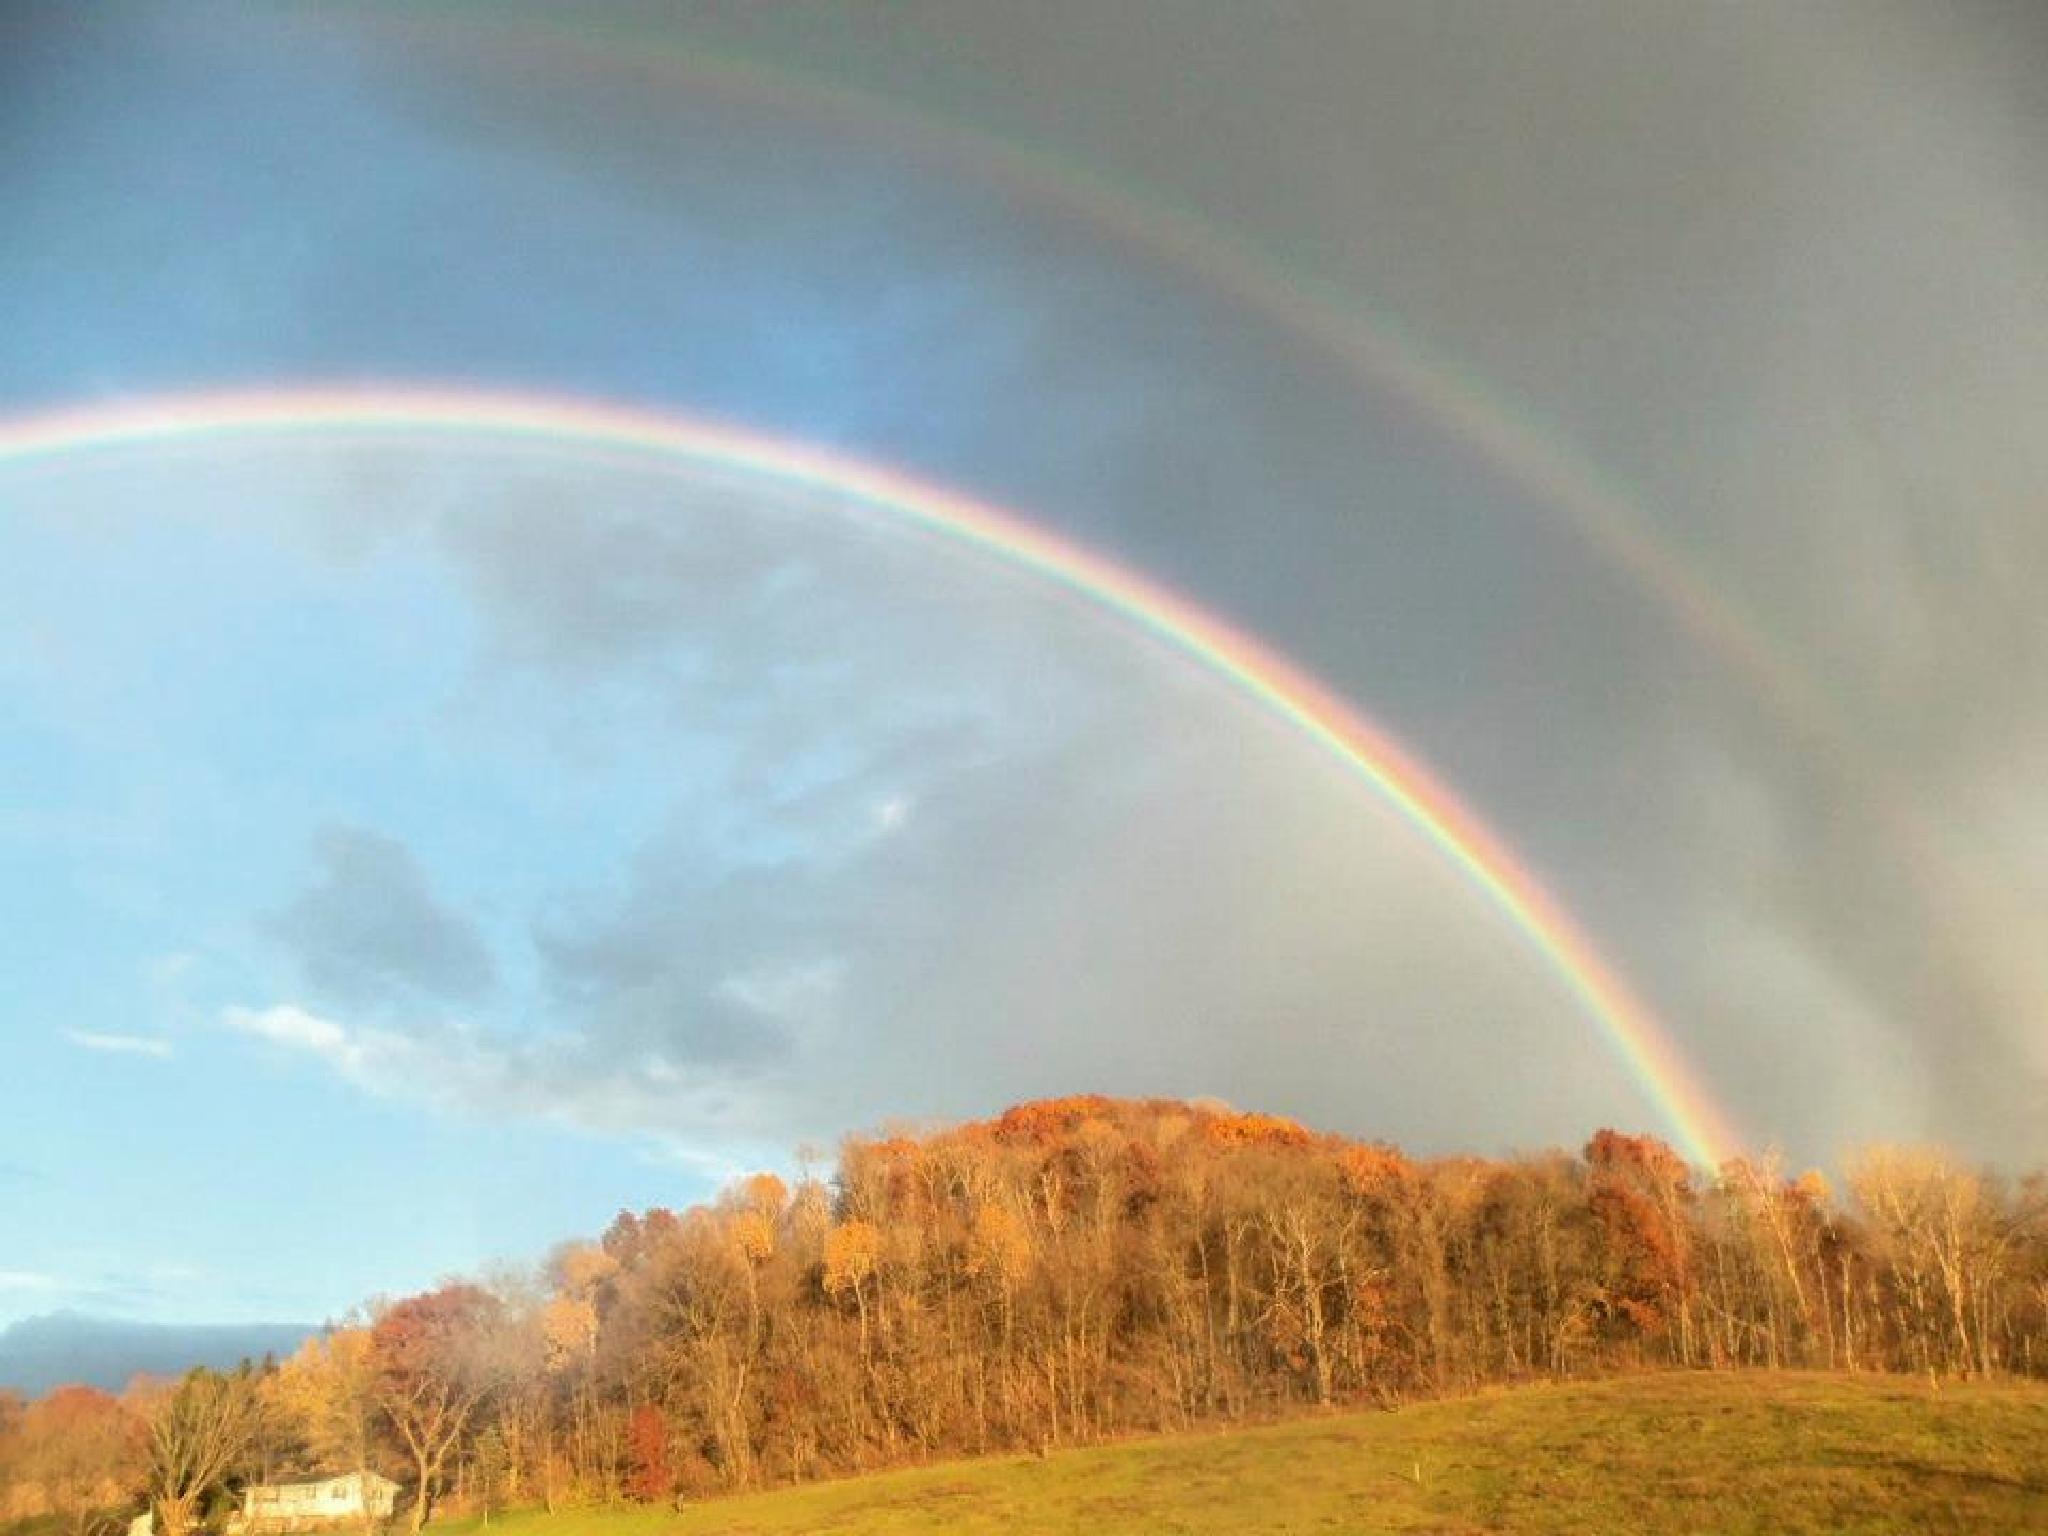 Triple Rainbow in rural Wisconsin by darlene.tagliapietra